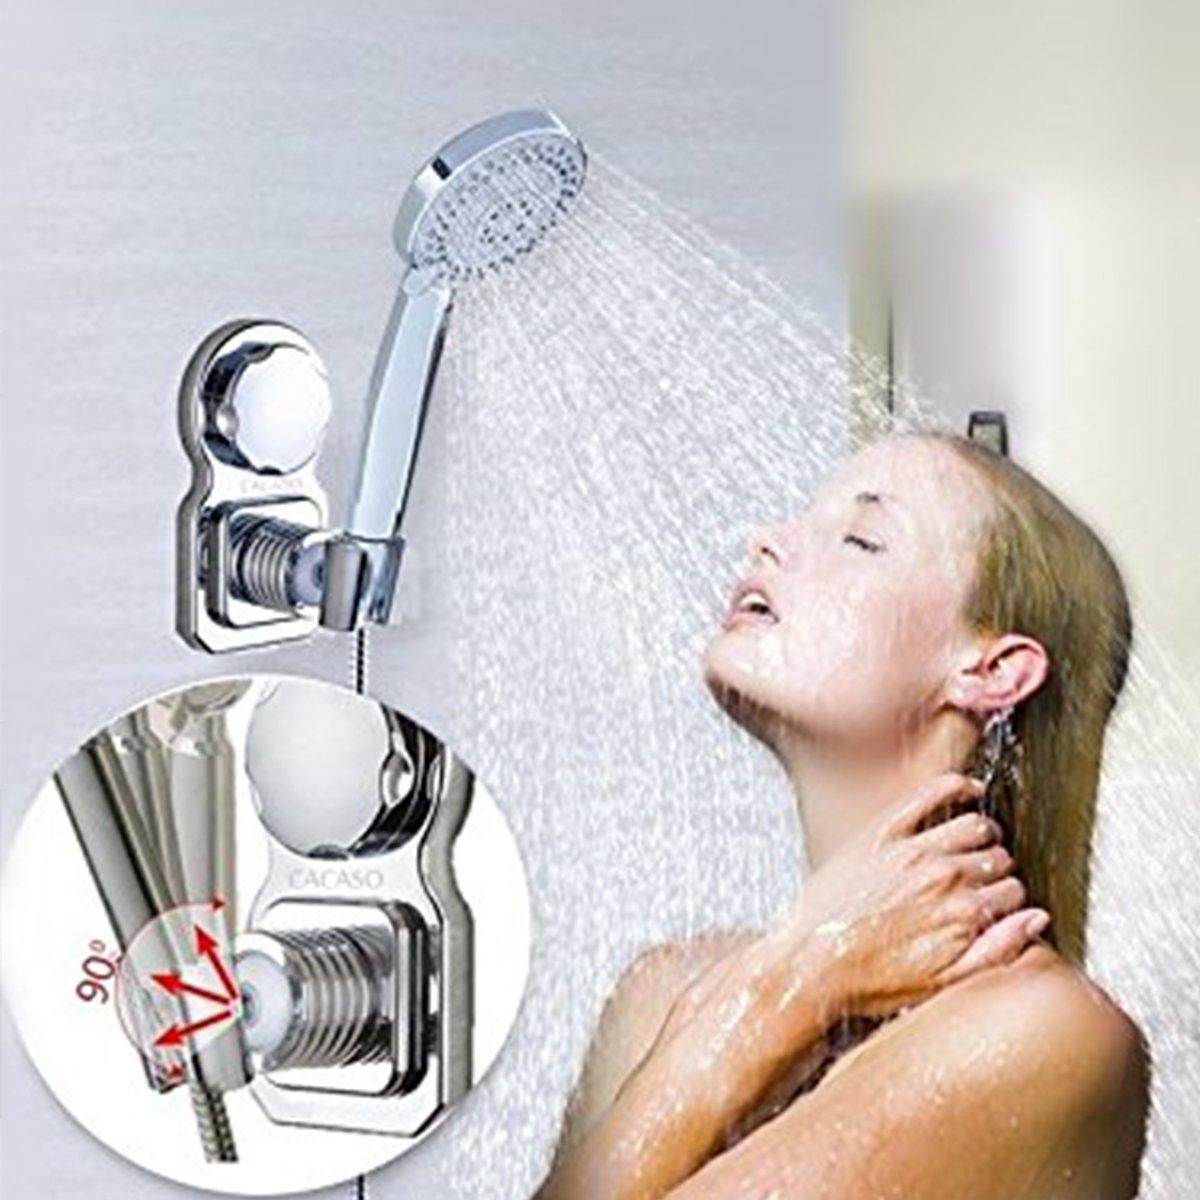 Confirm. shower positions for short girls